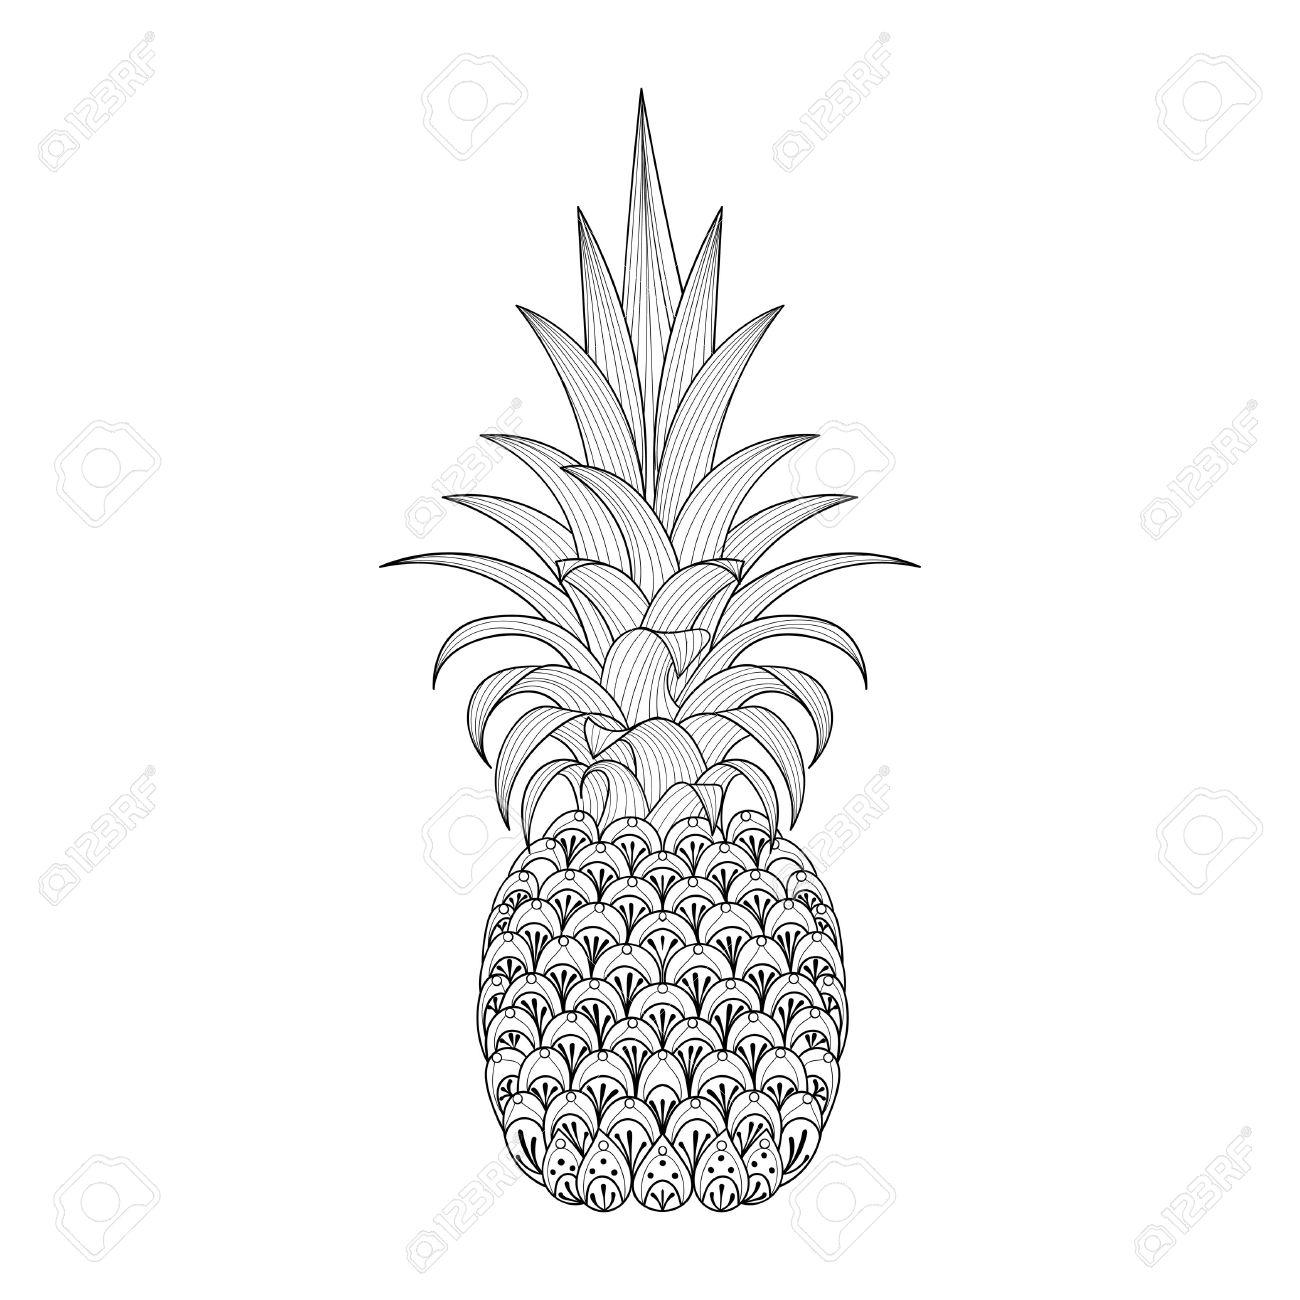 Dibujado A Mano De La Pia Adornado Fruta Extica Tribal Para